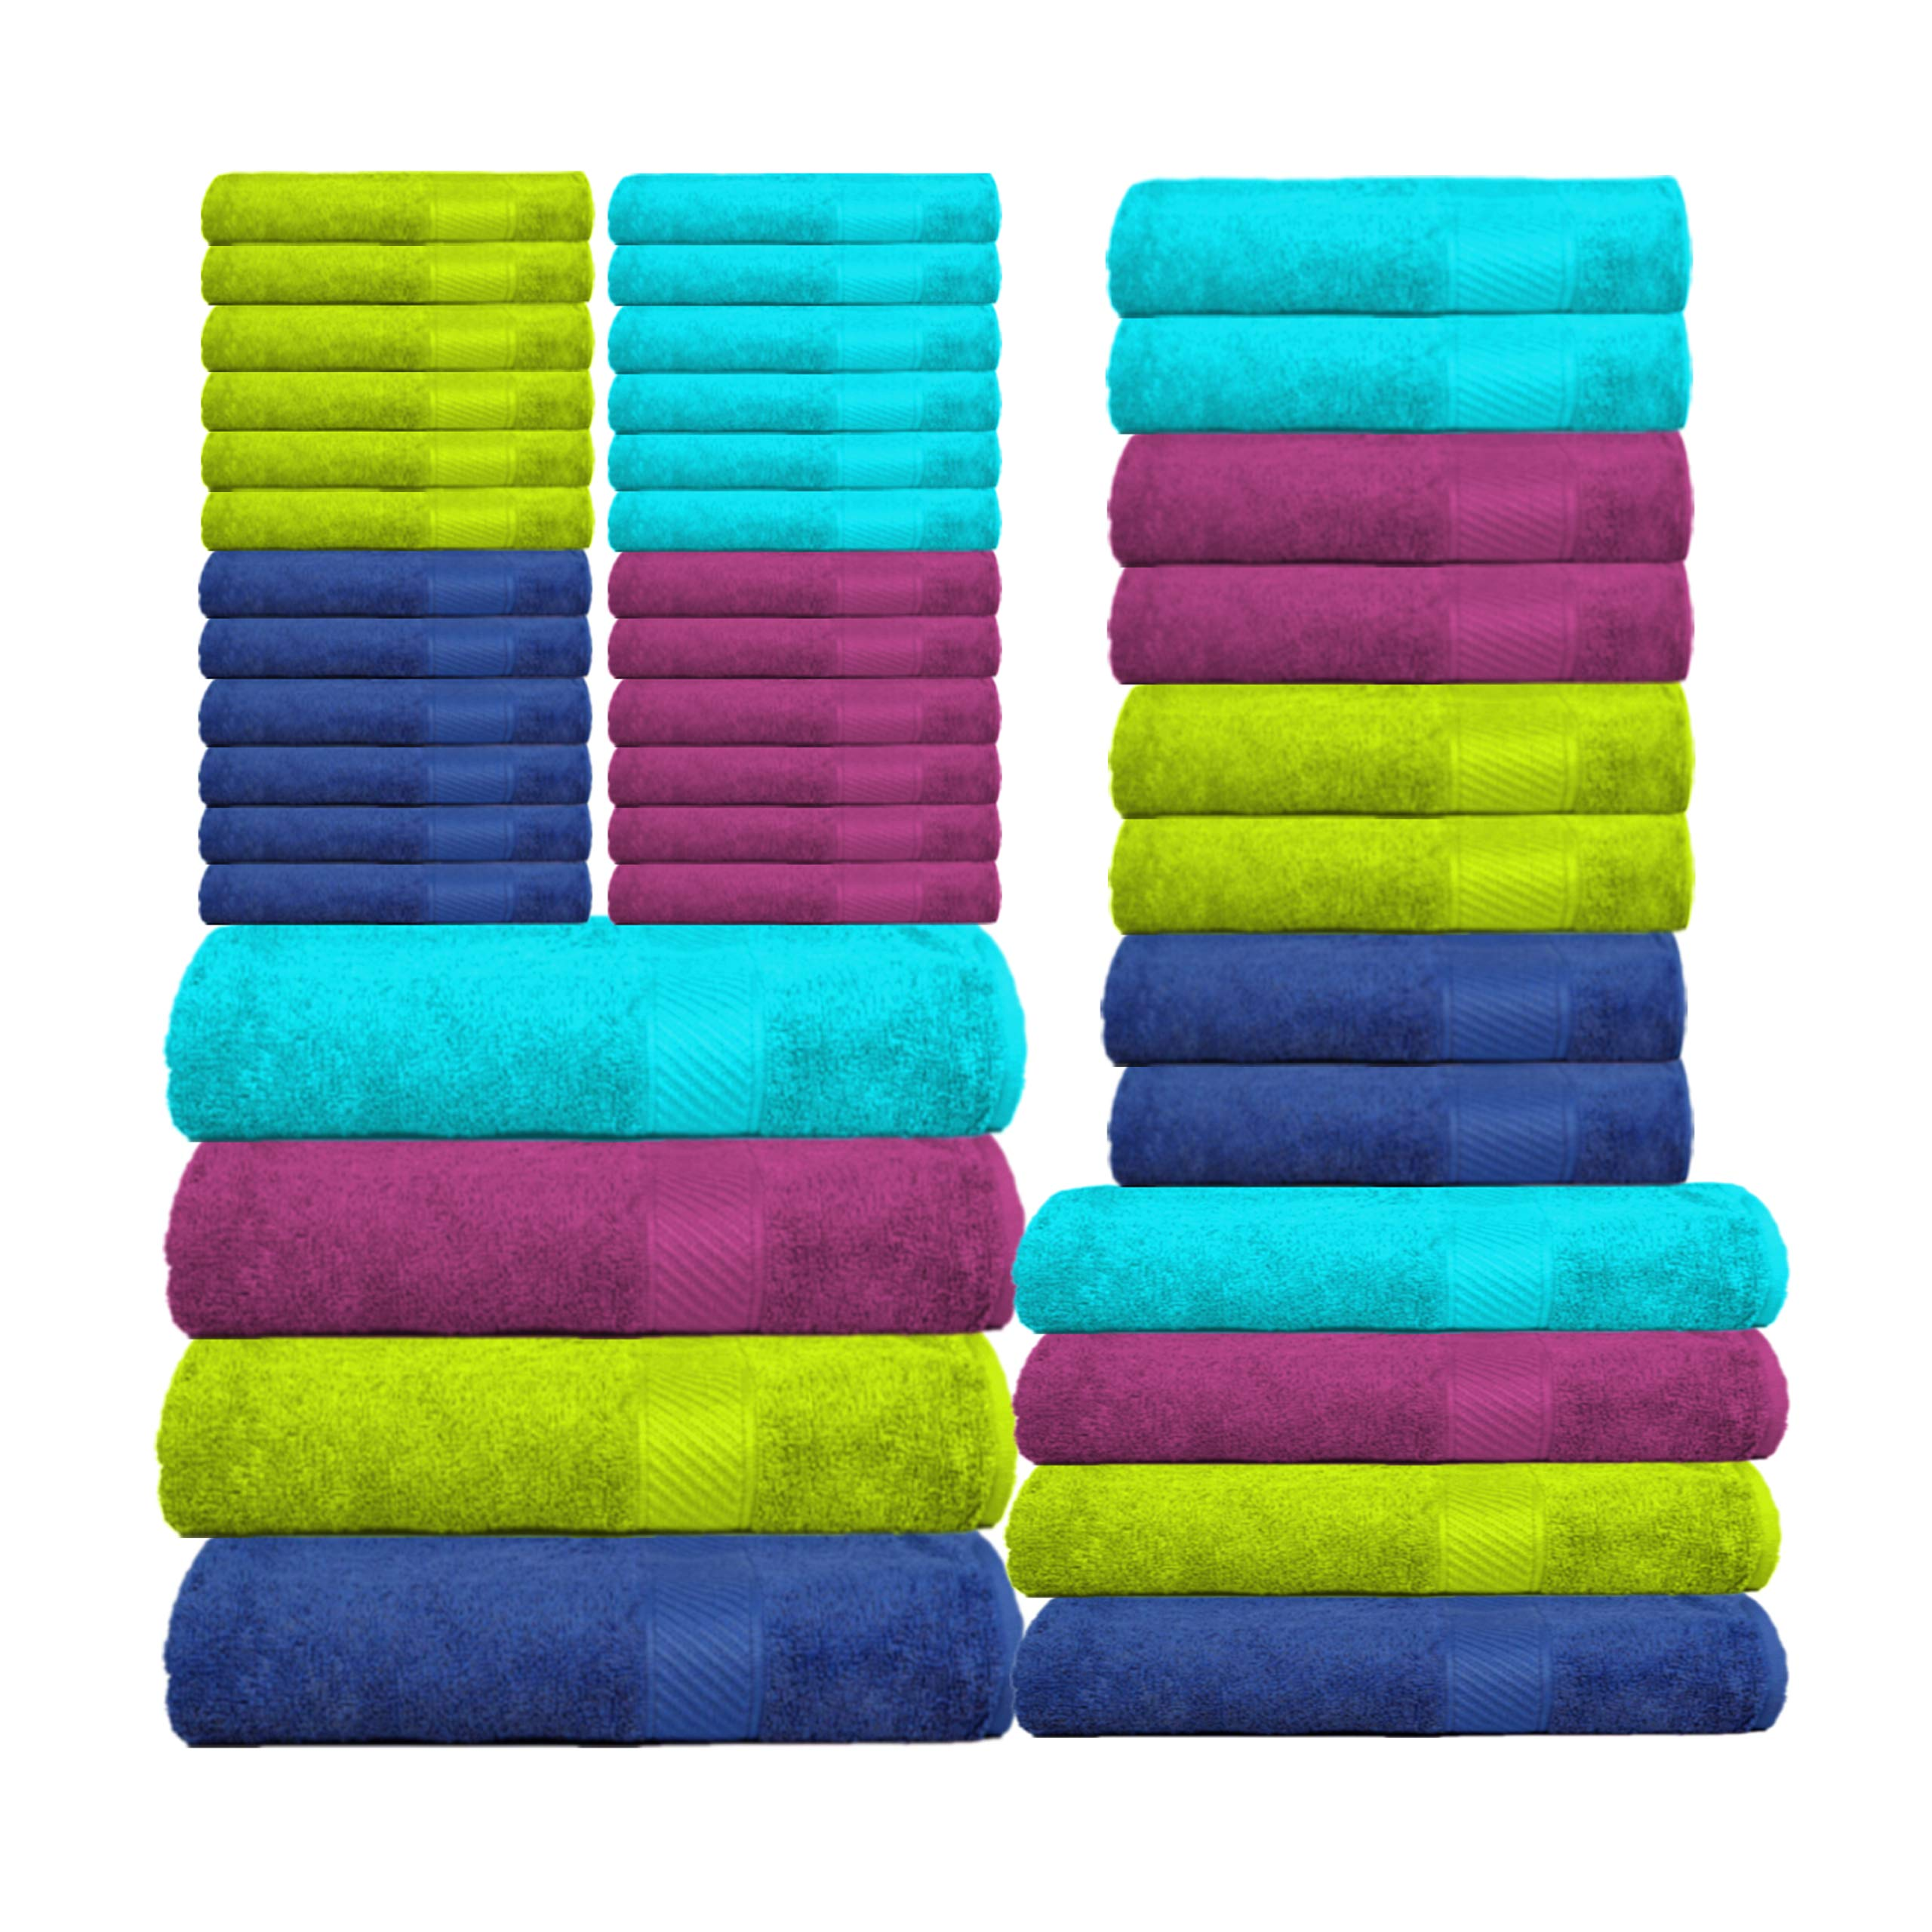 CASA COPENHAGEN Premium Towels, 40 Piece Towel Set (Teal. Purple, Green, Blue) - 8 Bath Towels(M,L), 8 Hand Towels and 24 Washcloths - Cotton - Hotel Quality - Super Soft - Highly Absorbent -